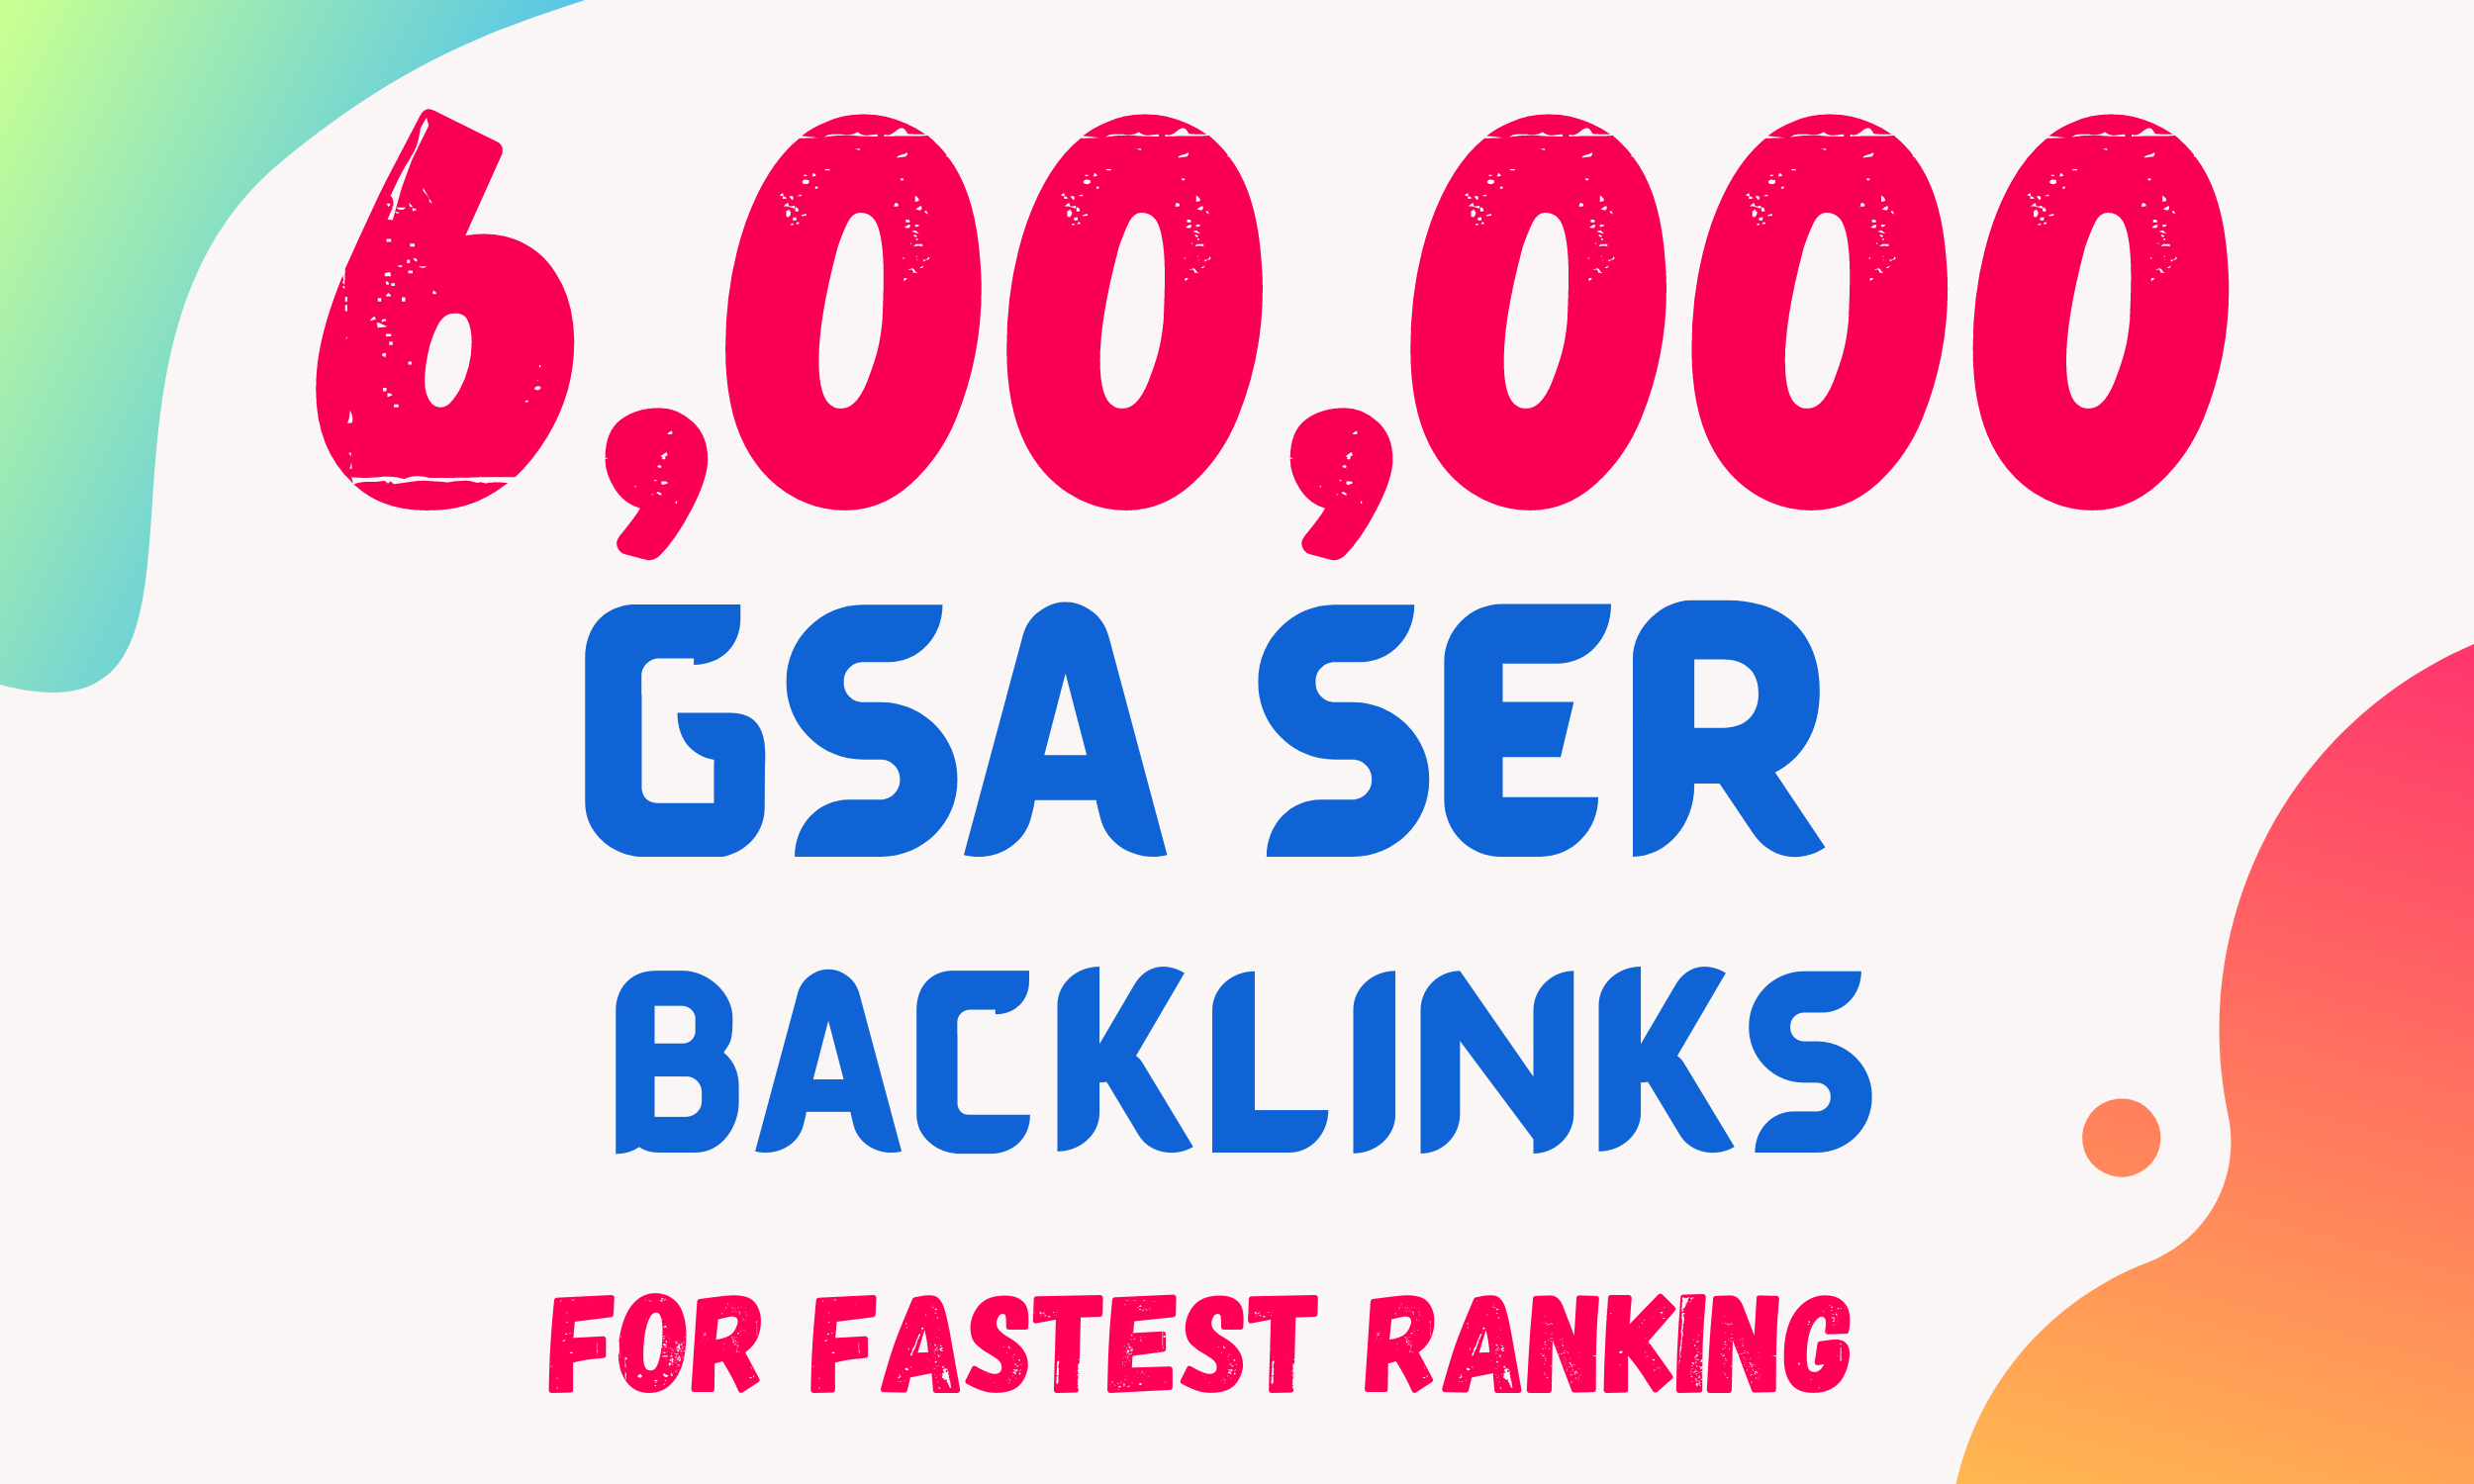 I will Create 600k High Quality GSA SER Backlinks and Rank your website on Google